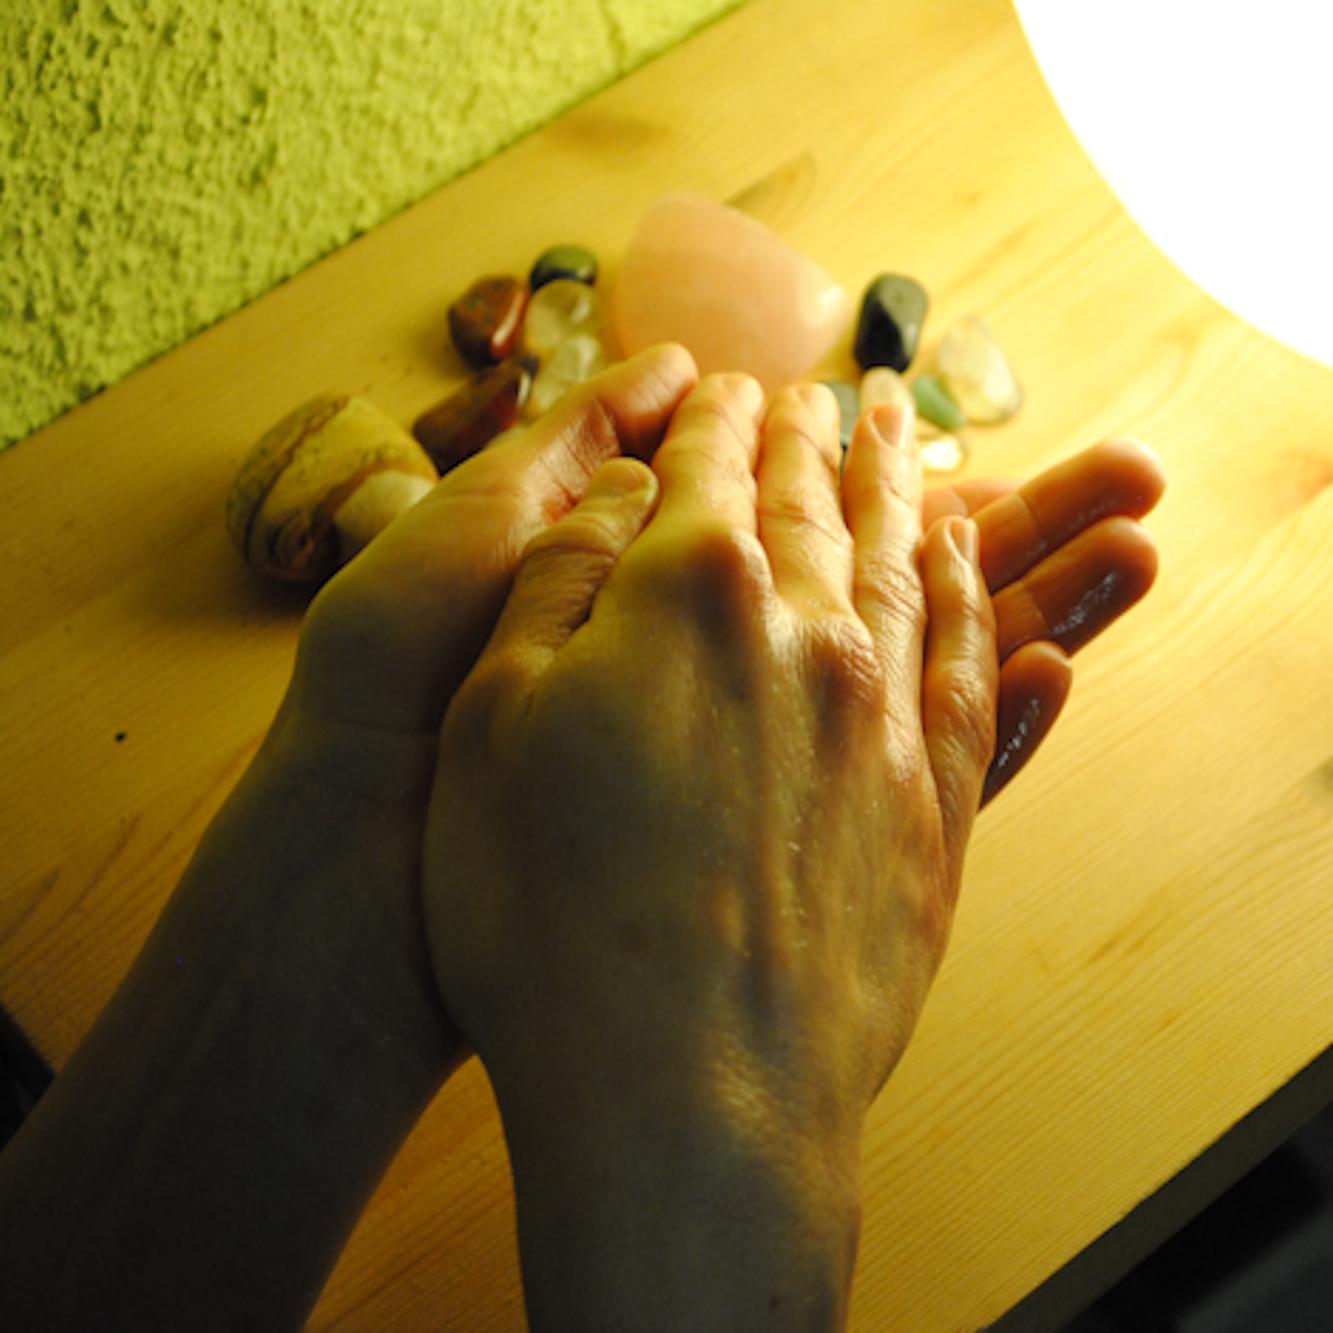 http://www.physio-scherdel.de/wp-content/uploads/2015/11/massage.jpg